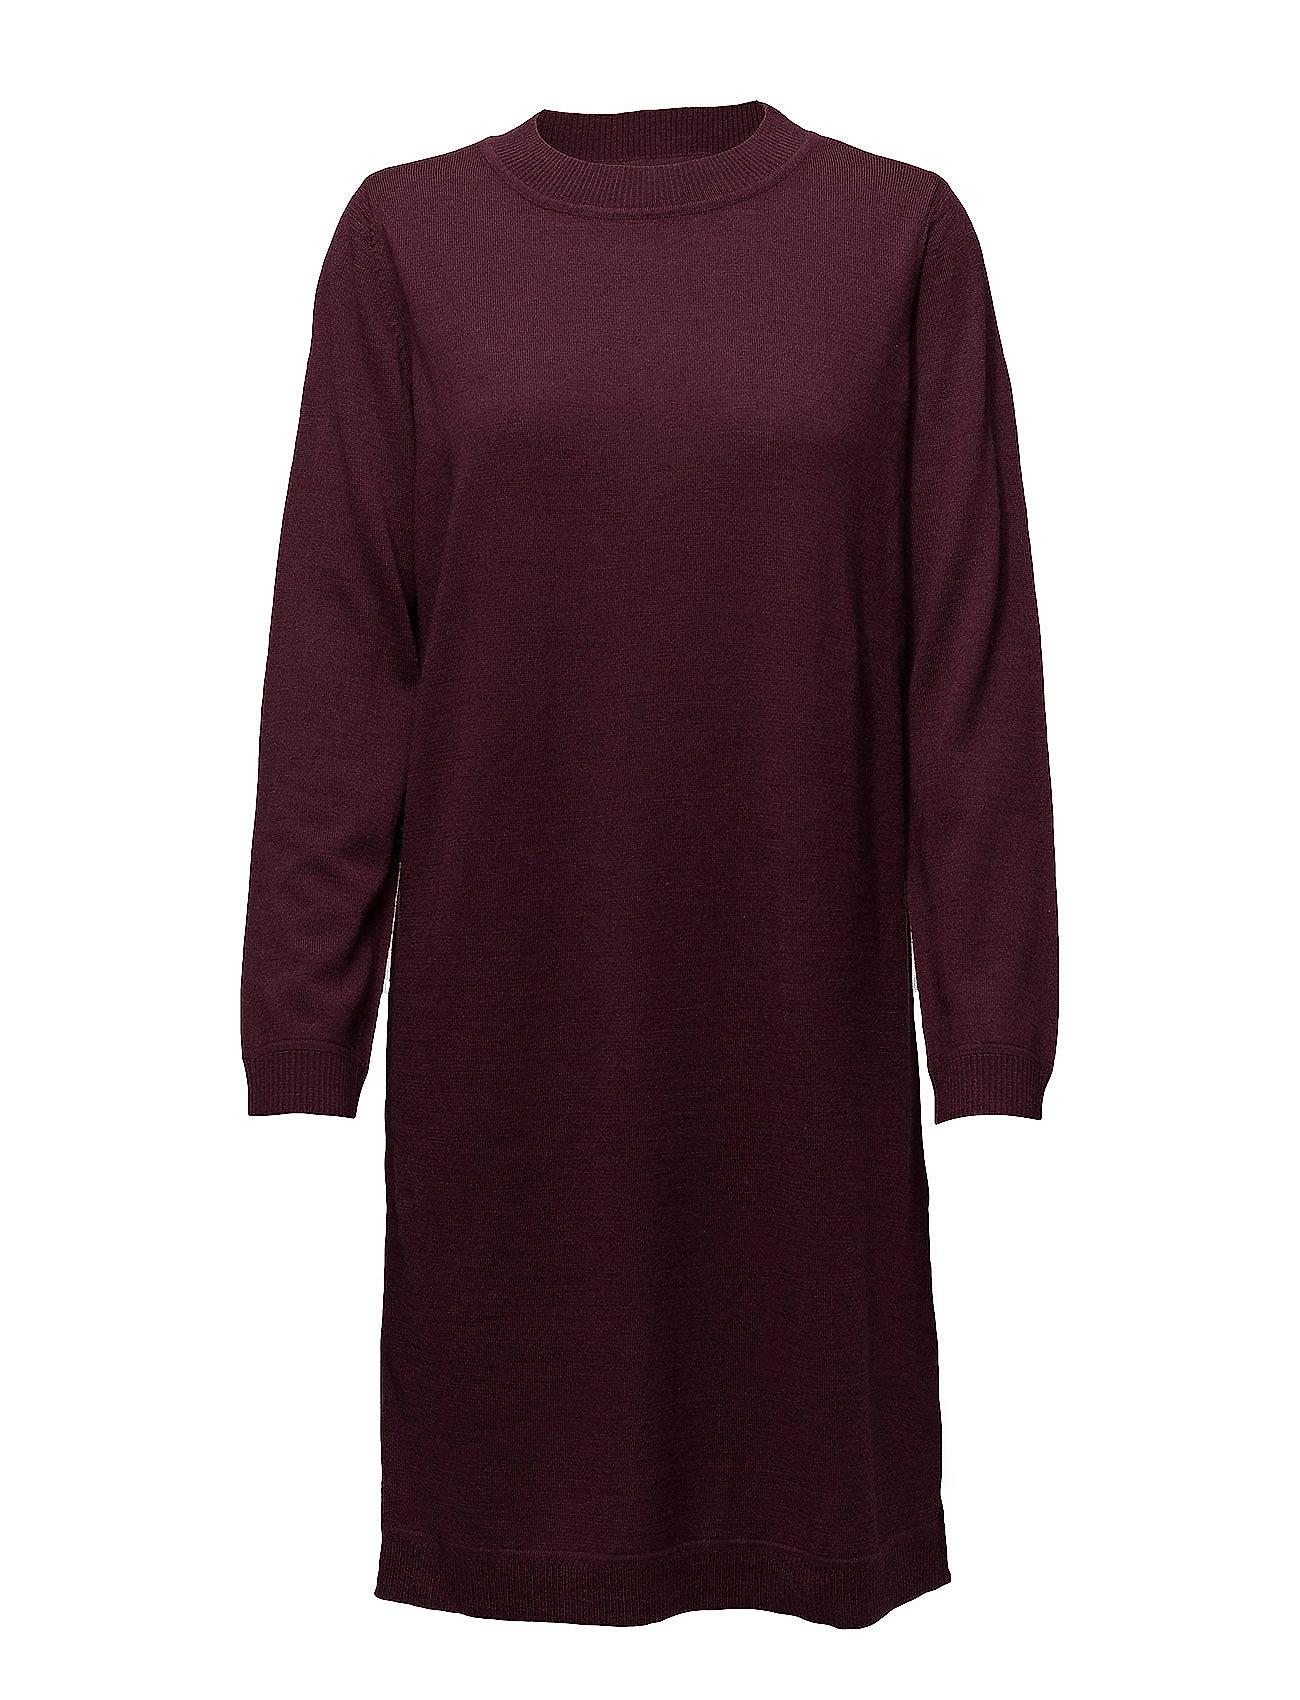 Sfeileen Ls Knit O-Neck Dress Selected Femme Dresses thumbnail